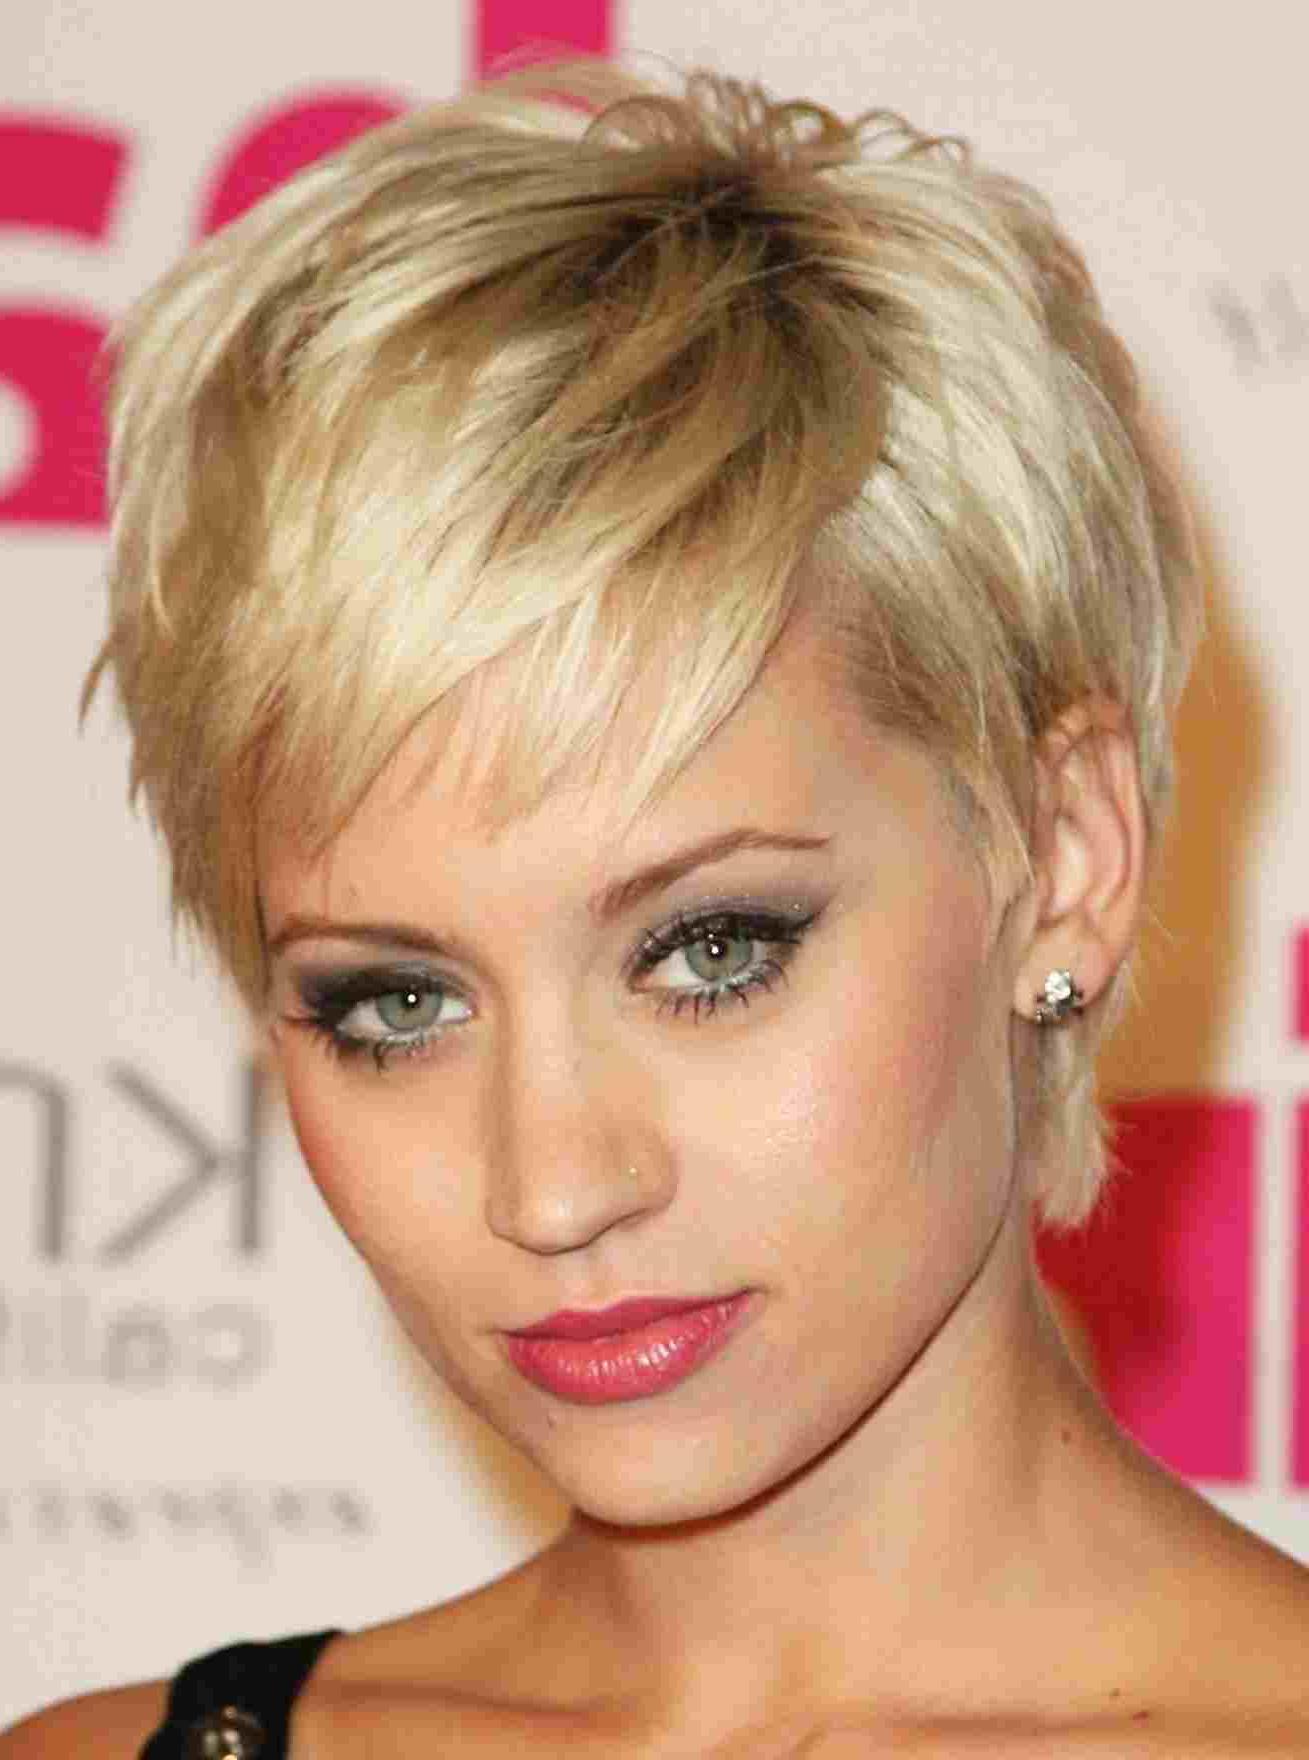 Hair Color Rhlovinggreececom Wedge Hairstyle U Manrhexsecratuscom Within Wedge Short Haircuts (View 9 of 25)